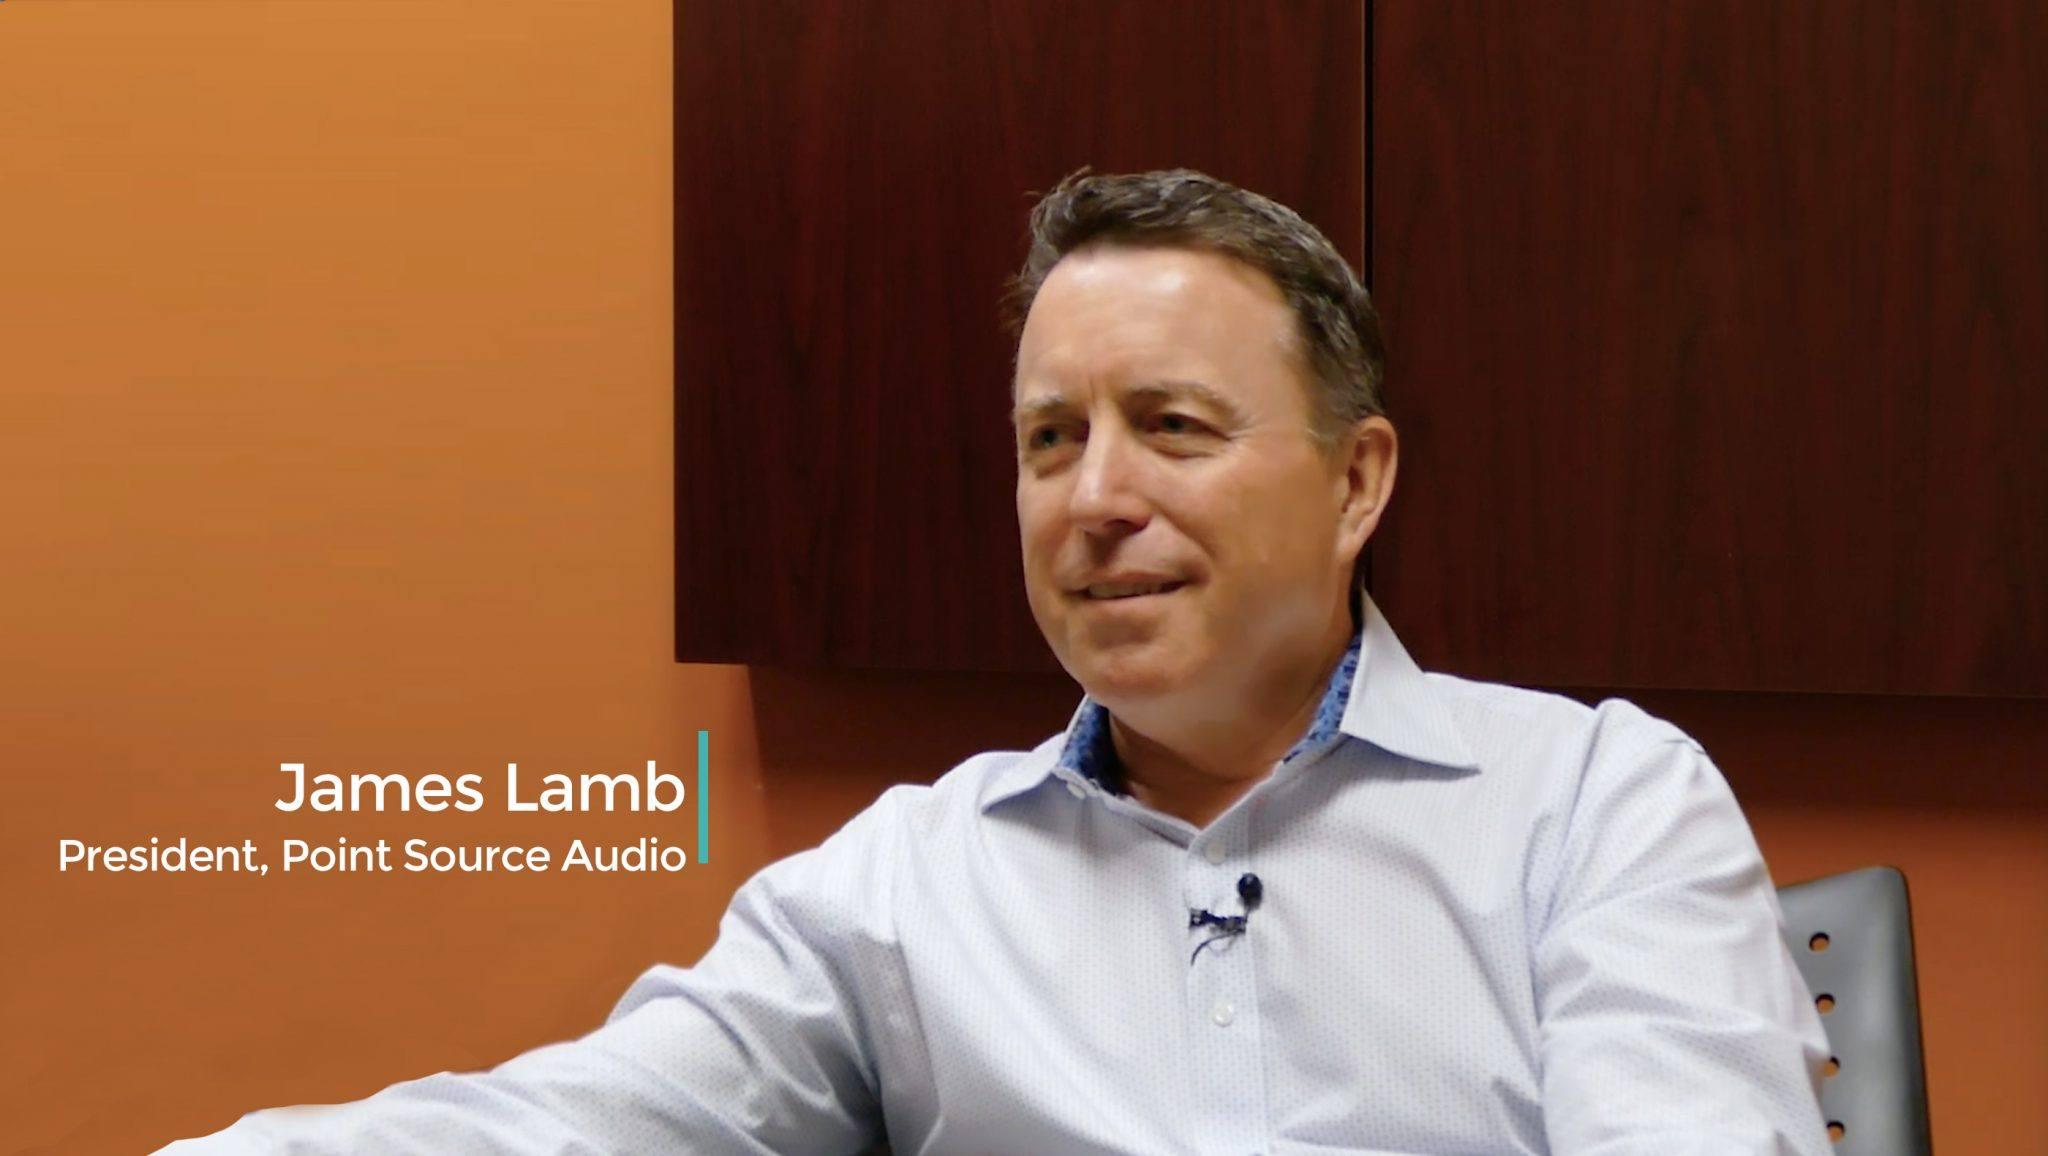 James Lamb, How We Got Here